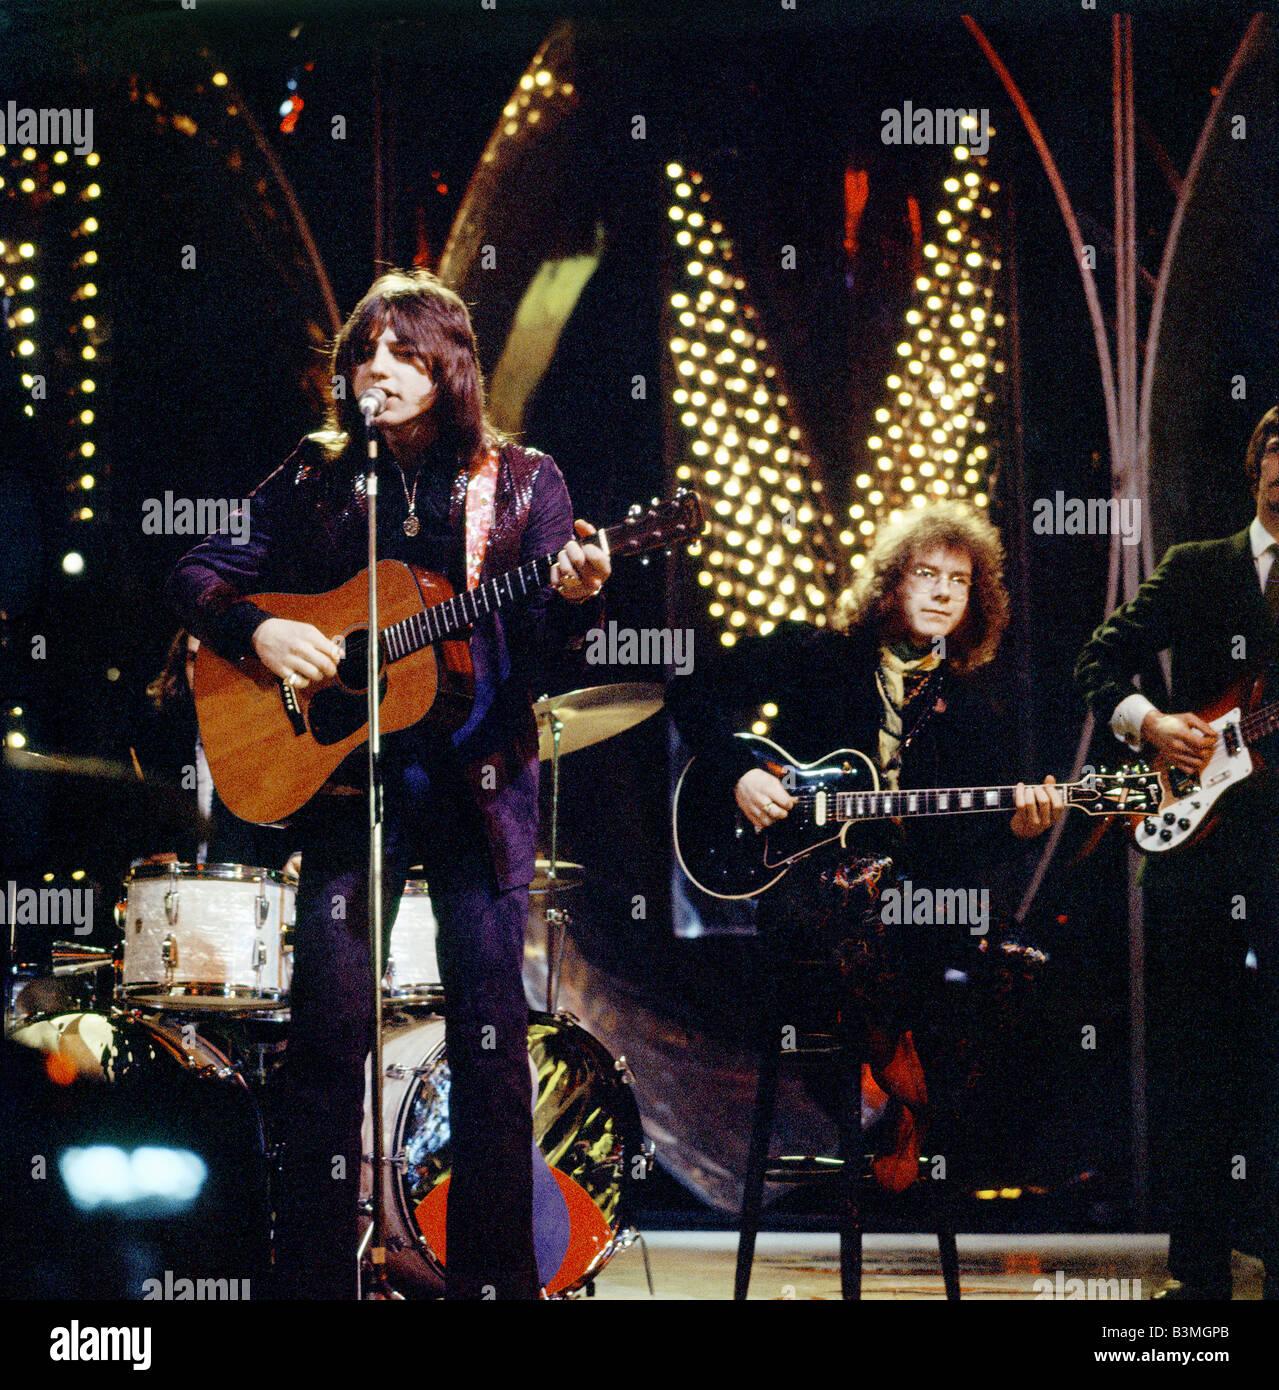 KING CRIMSON - UK/US groupe pop en 1970 avec Greg Lake à gauche et Robert Fripp - photo Tony Gale Photo Stock